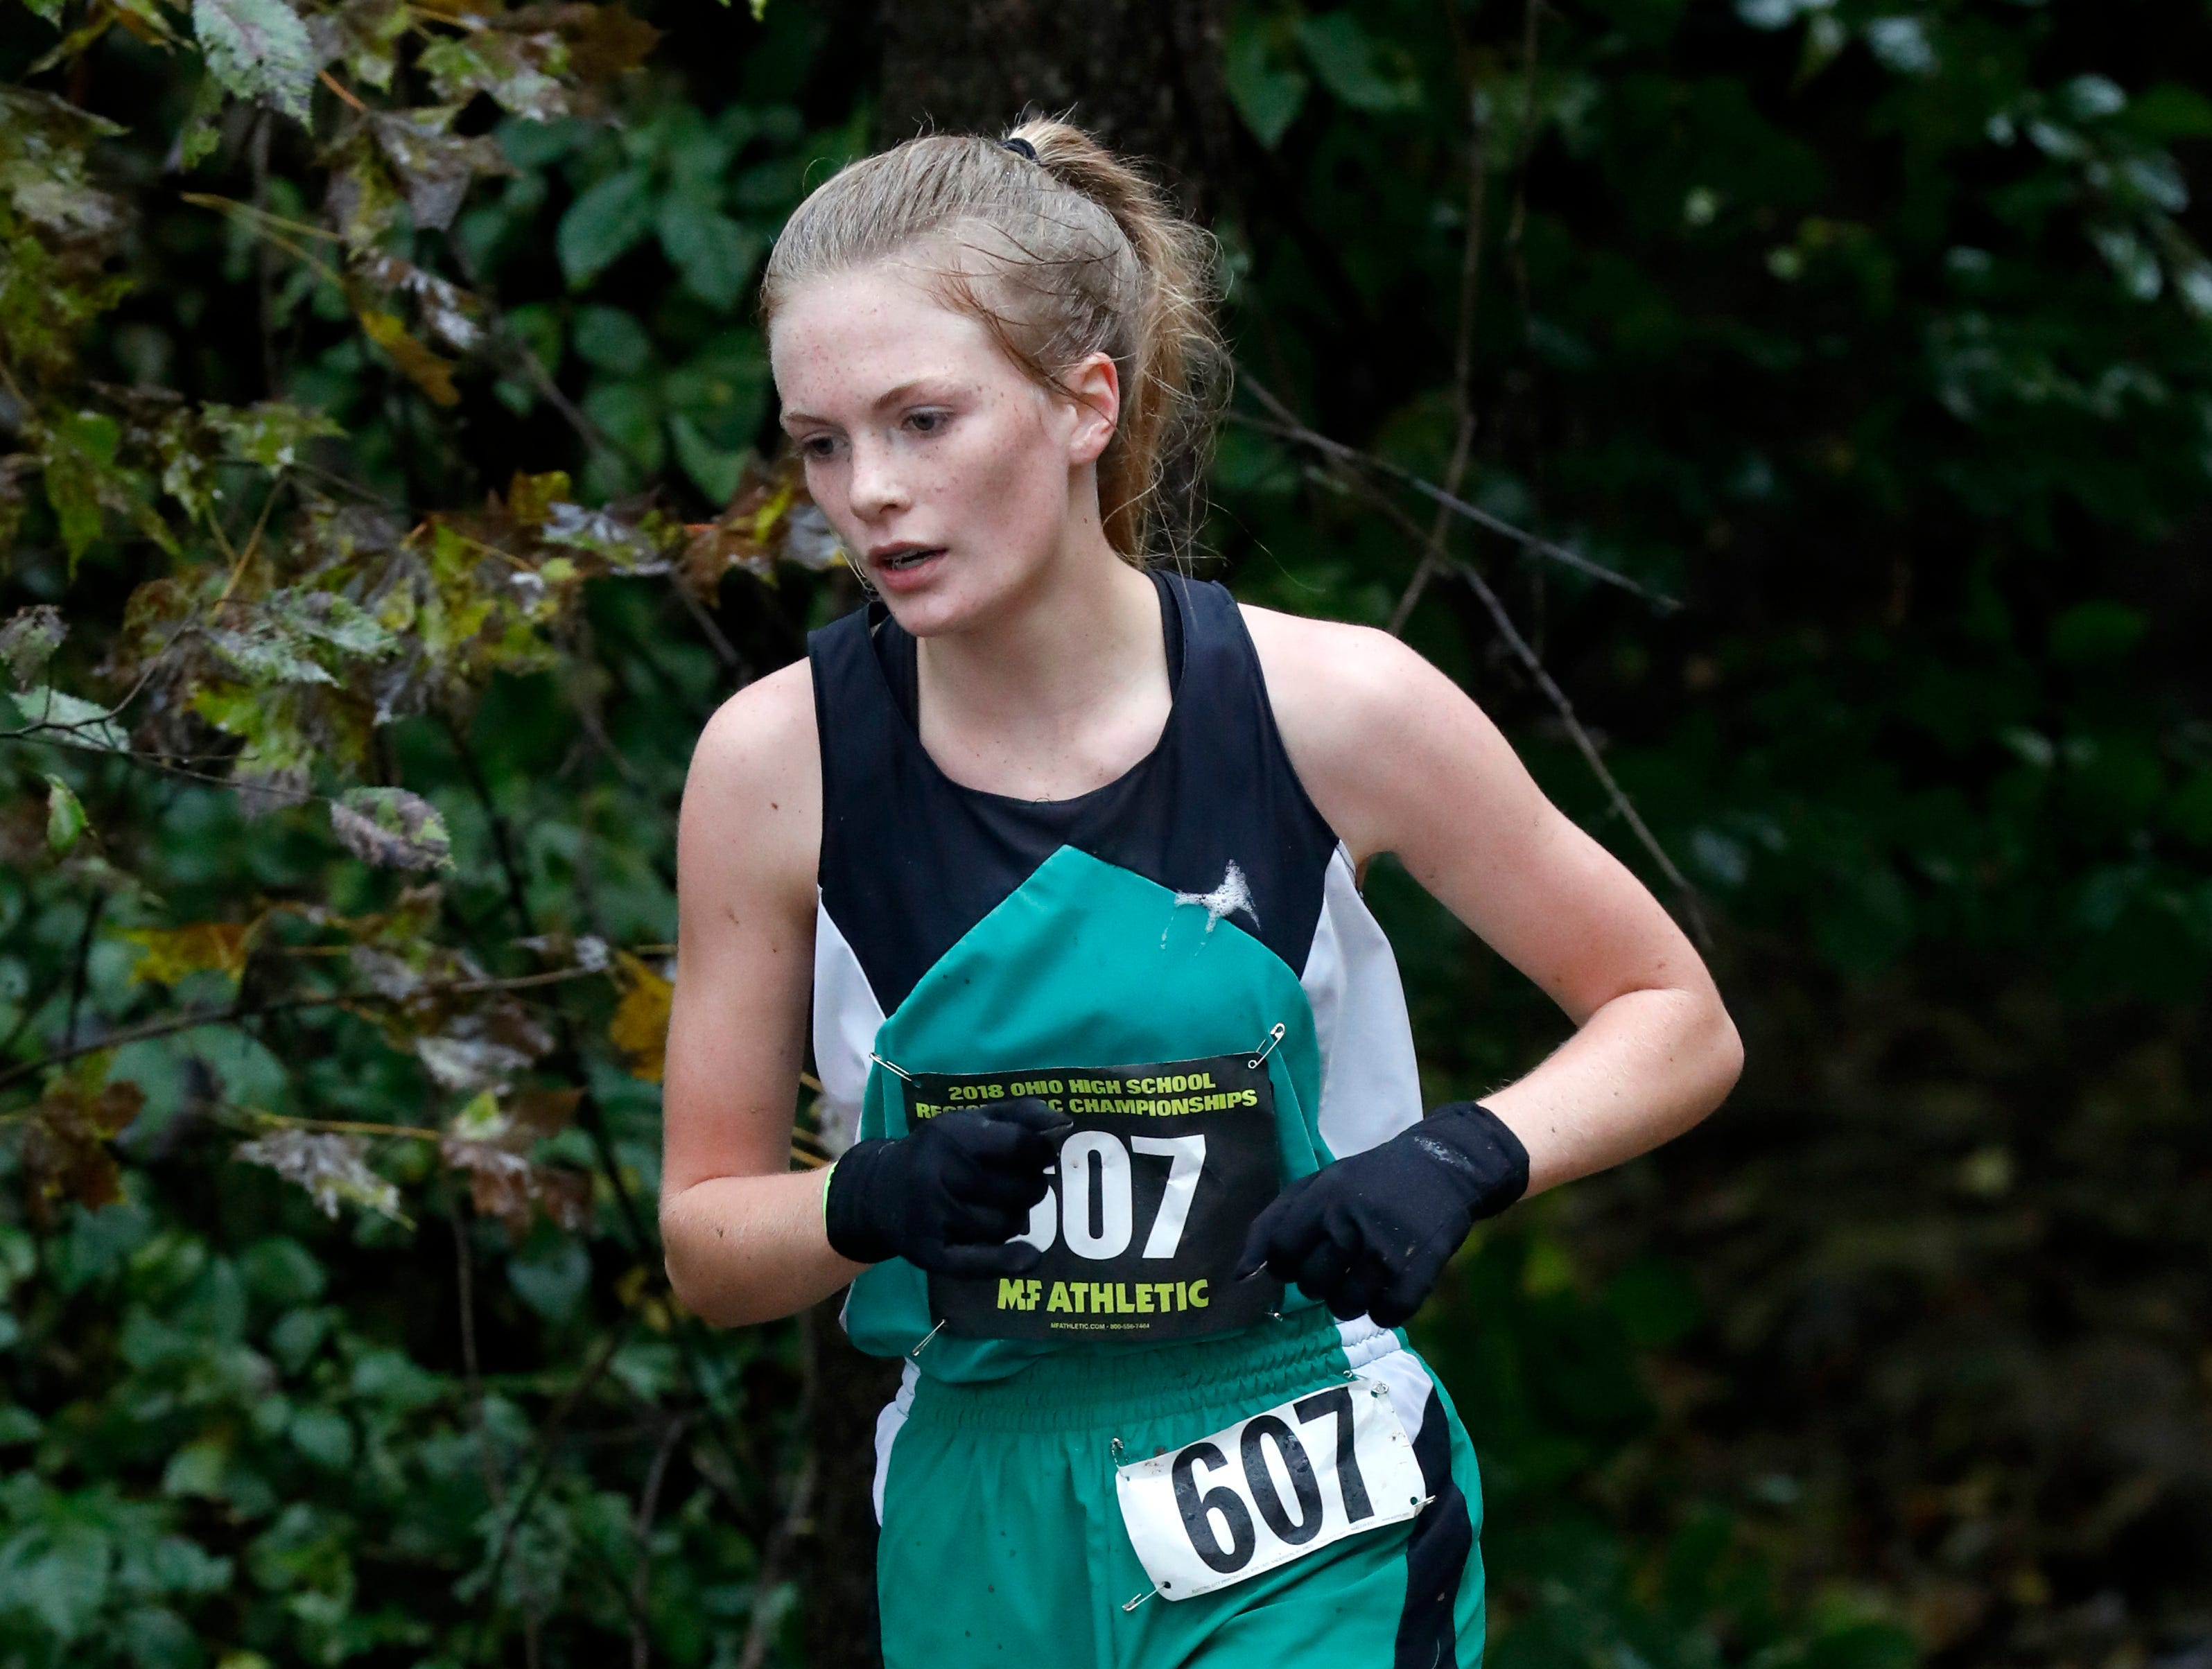 Huntington's Cindy Hopkins runs in the Regional Cross Country meet Saturday, Oct. 27, 2018, at Pickerington North High School in Pickerington.